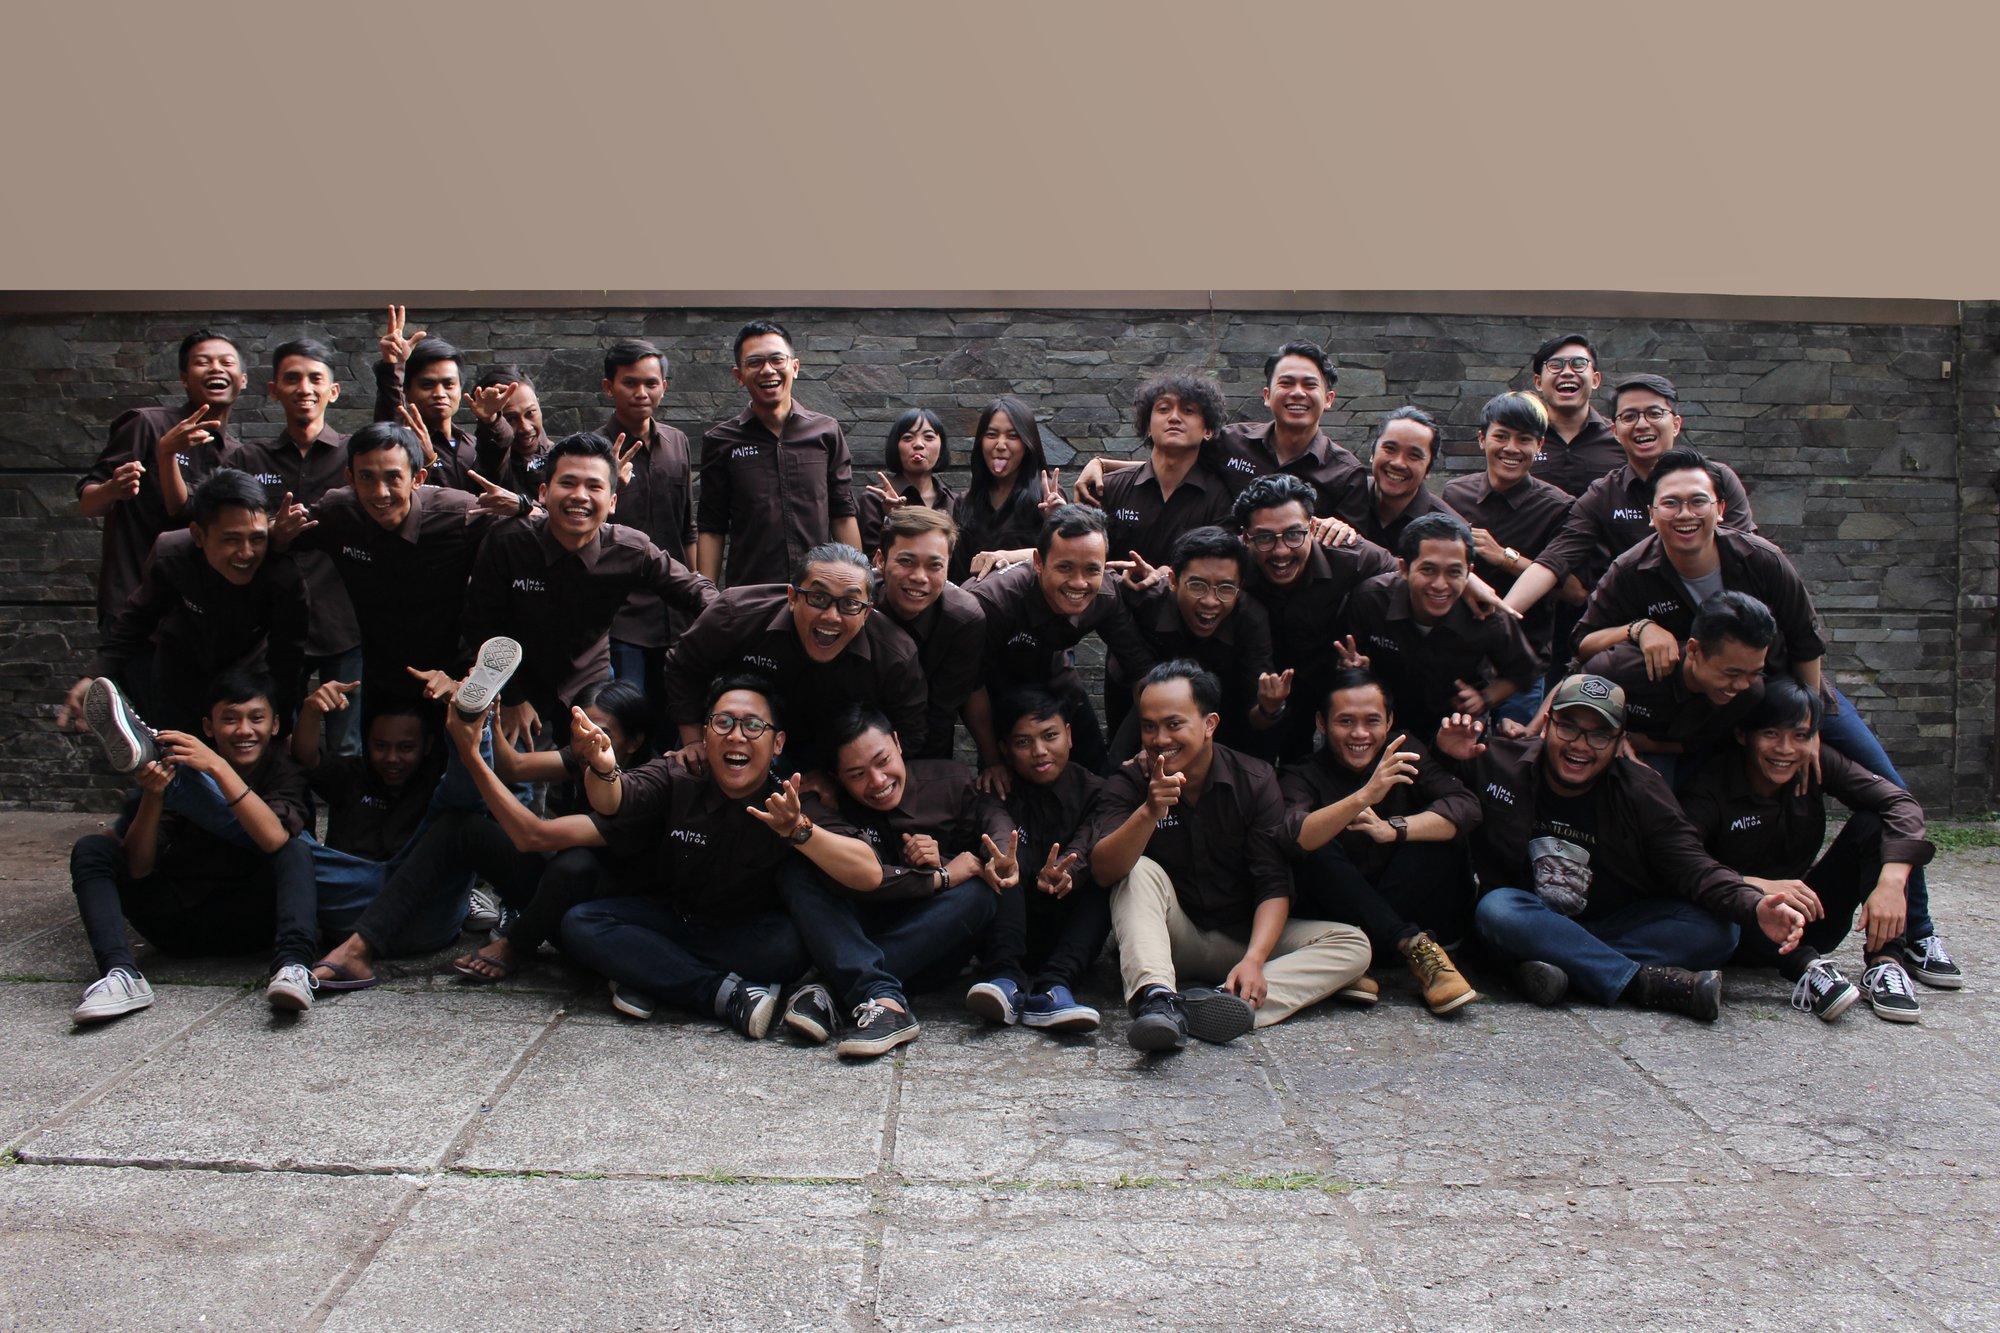 Matoa team